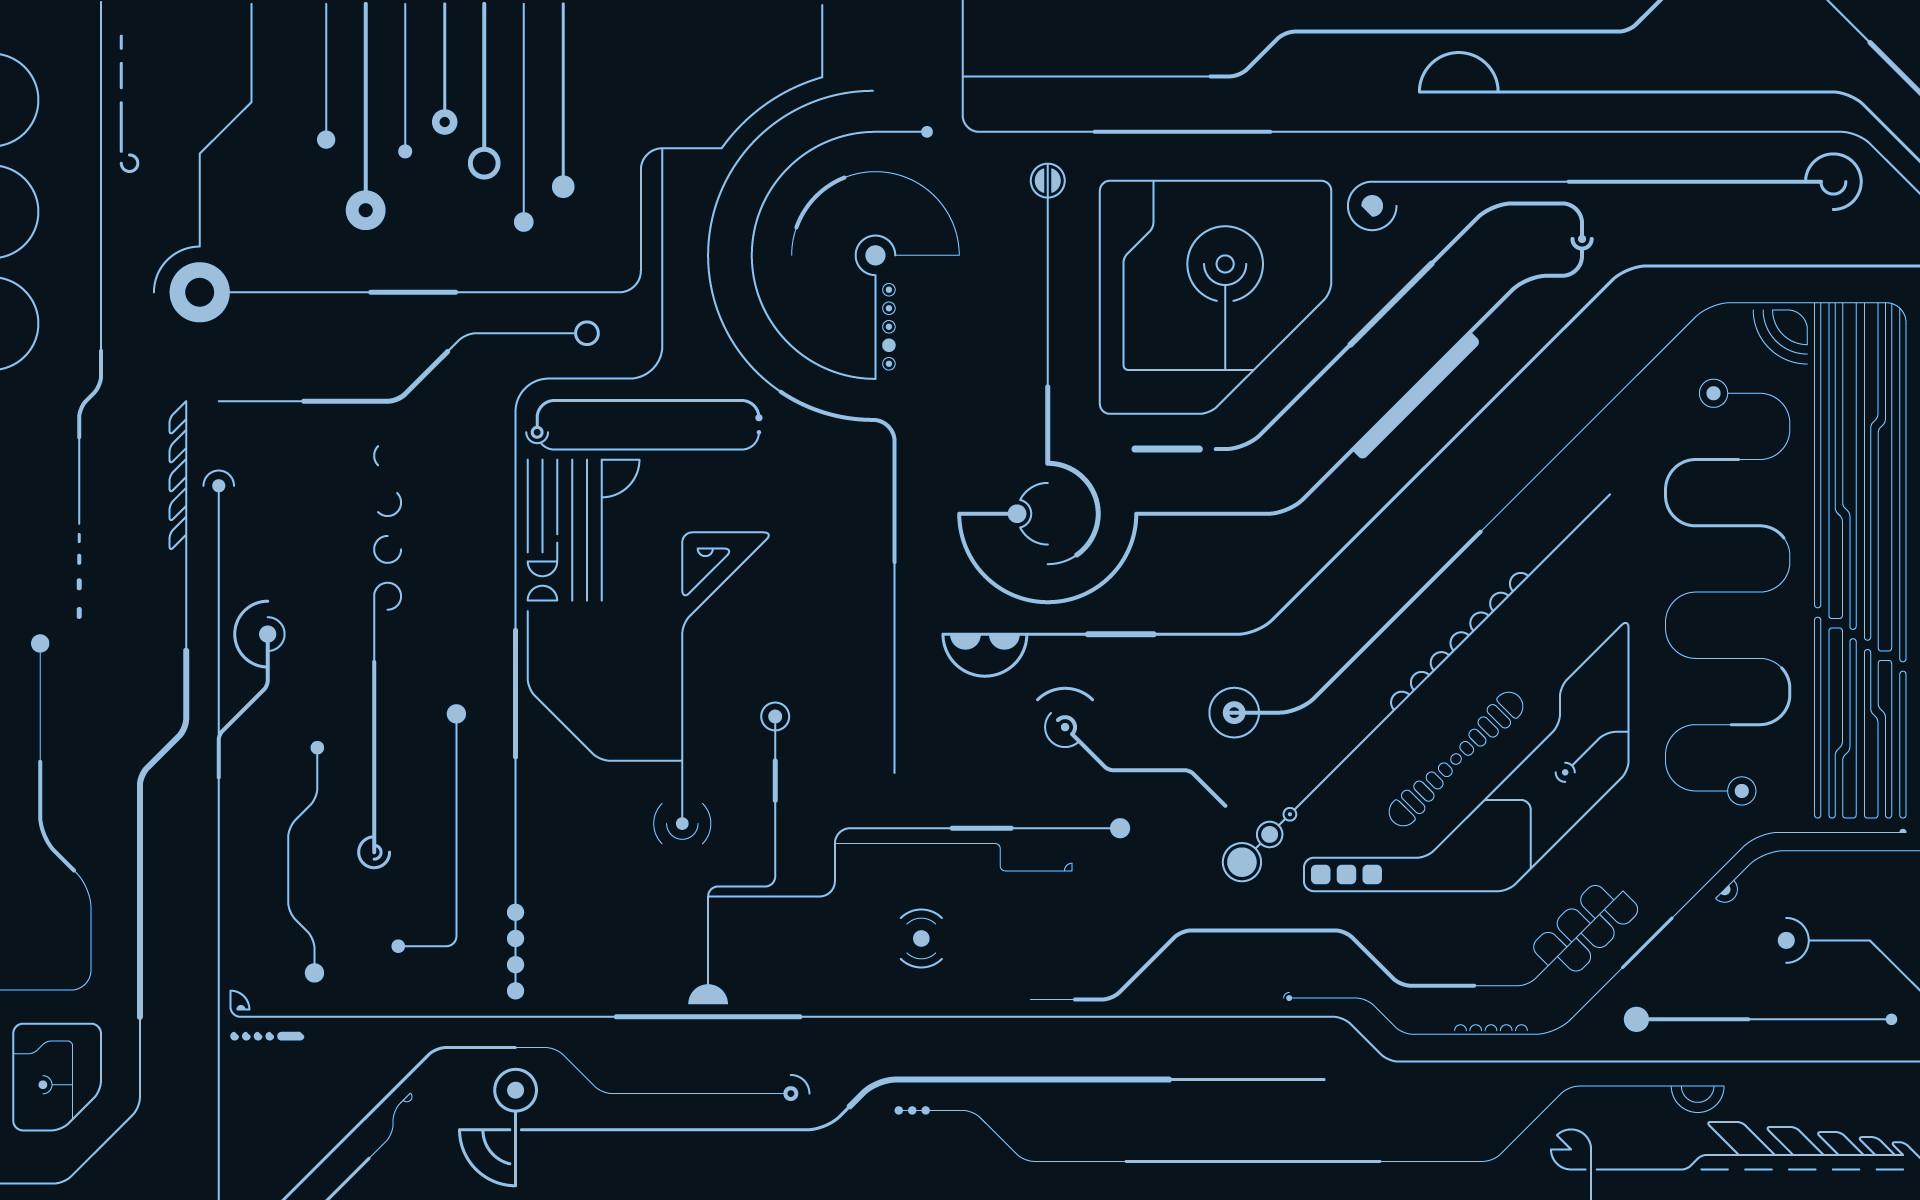 Cool Techno Backgrounds | wallpaper, wallpaper hd, background desktop